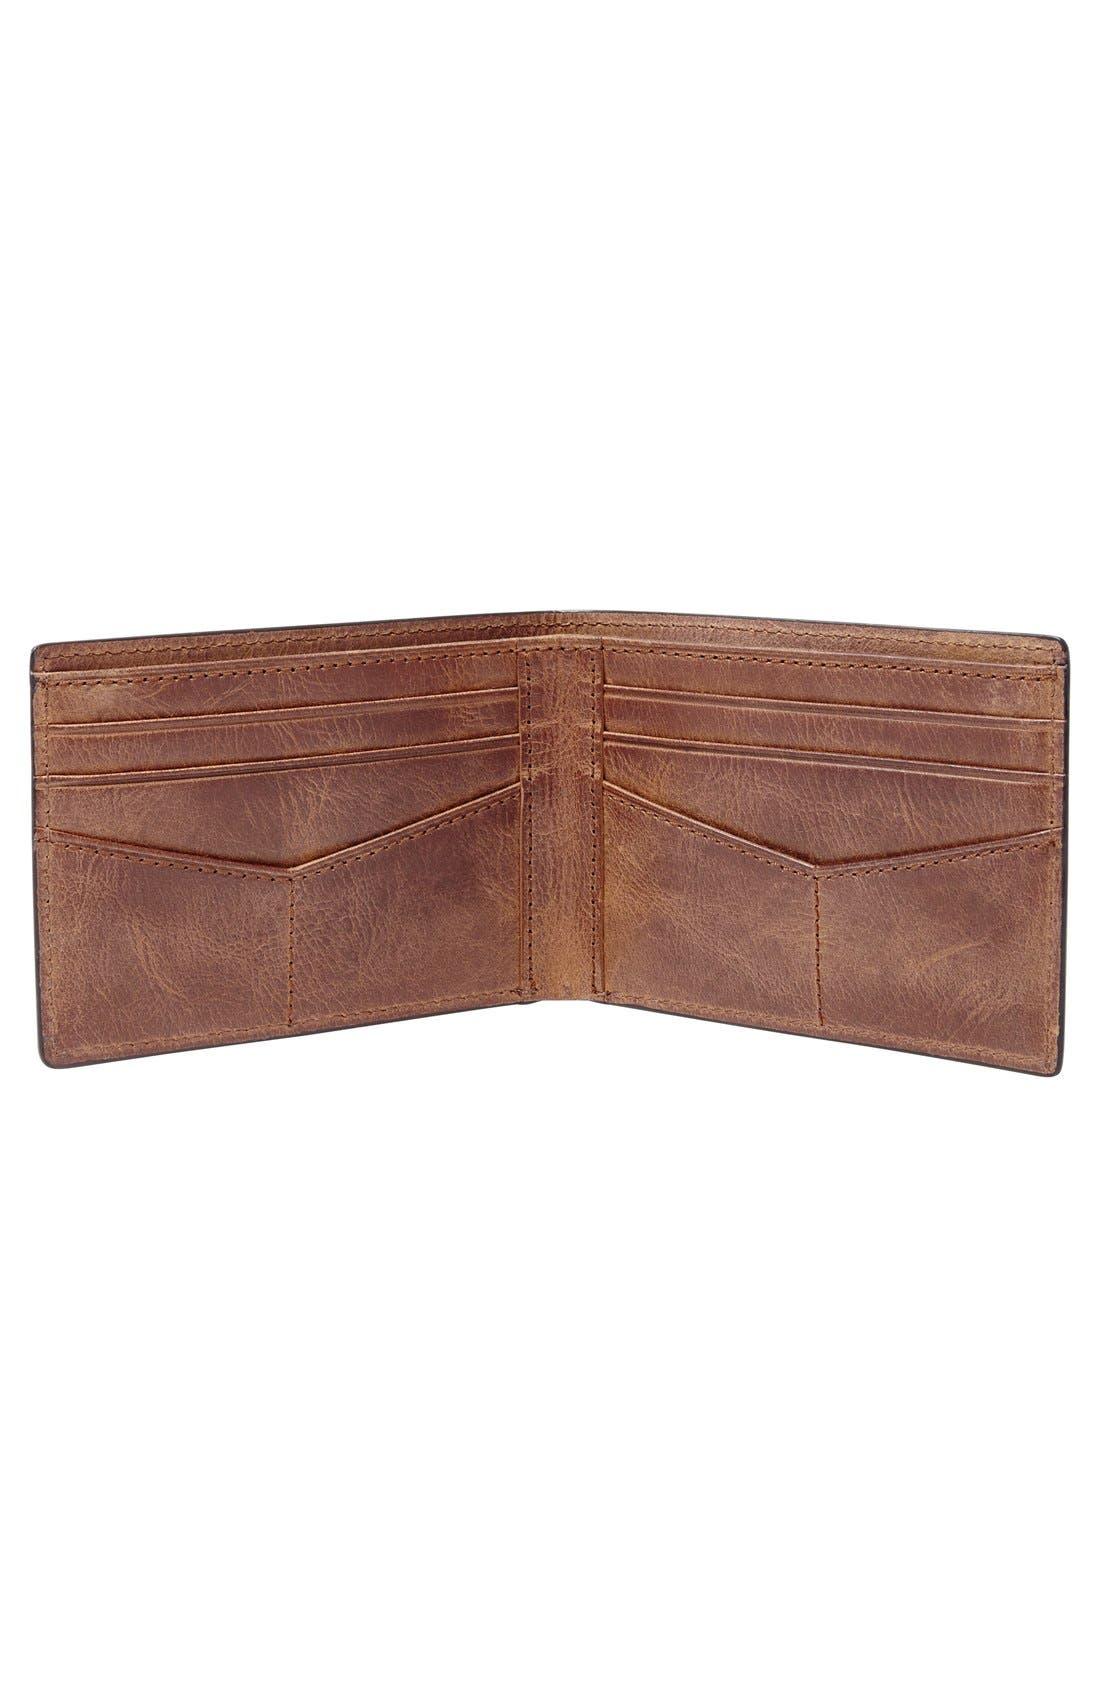 'Derrick' Leather Front Pocket Bifold Wallet,                             Alternate thumbnail 2, color,                             Brown